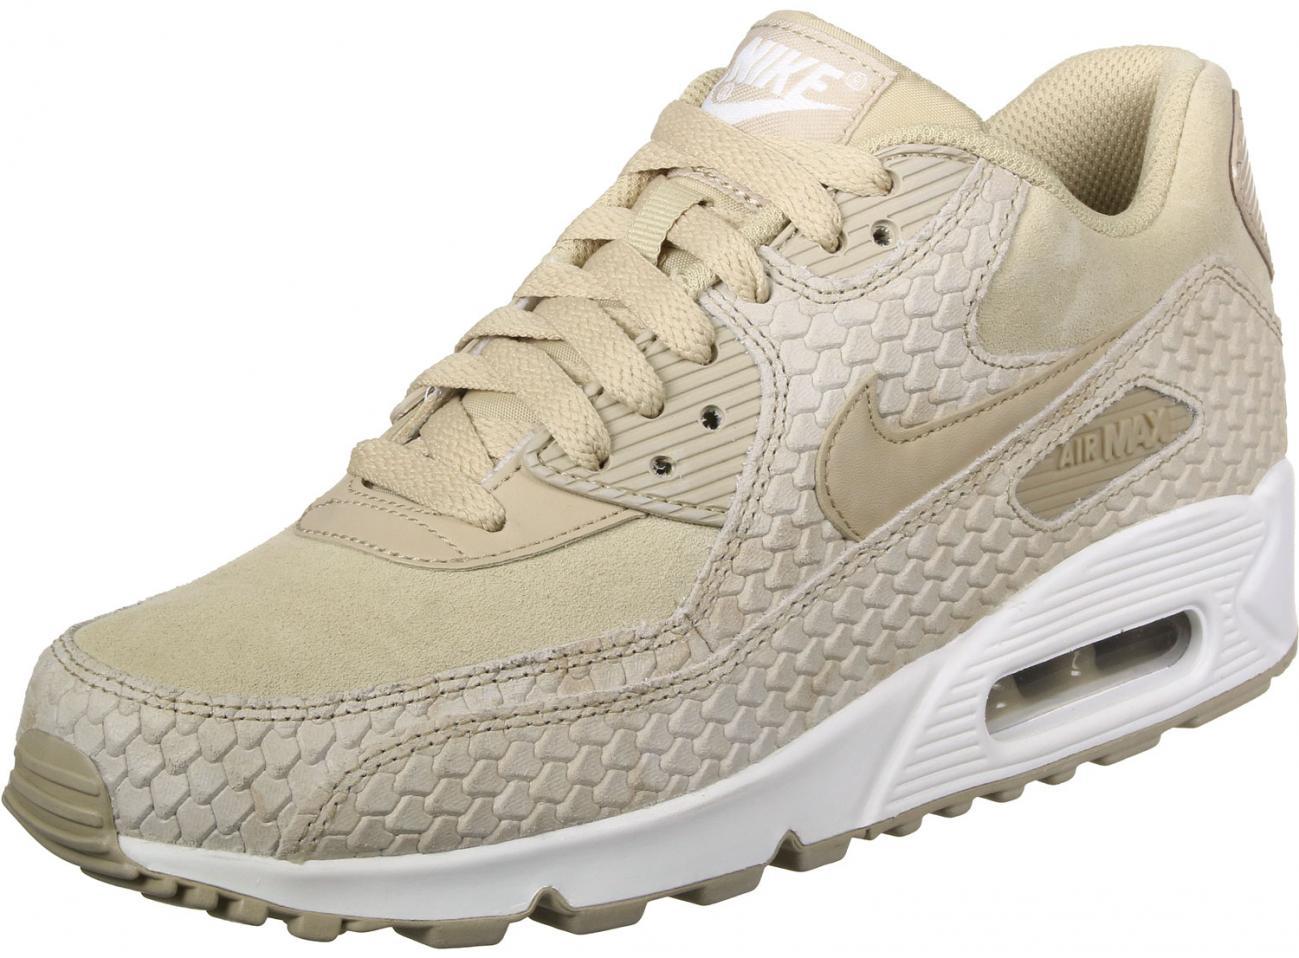 nike air max 90 beige femme solde,Nike Air Max 90 Premium beige ...